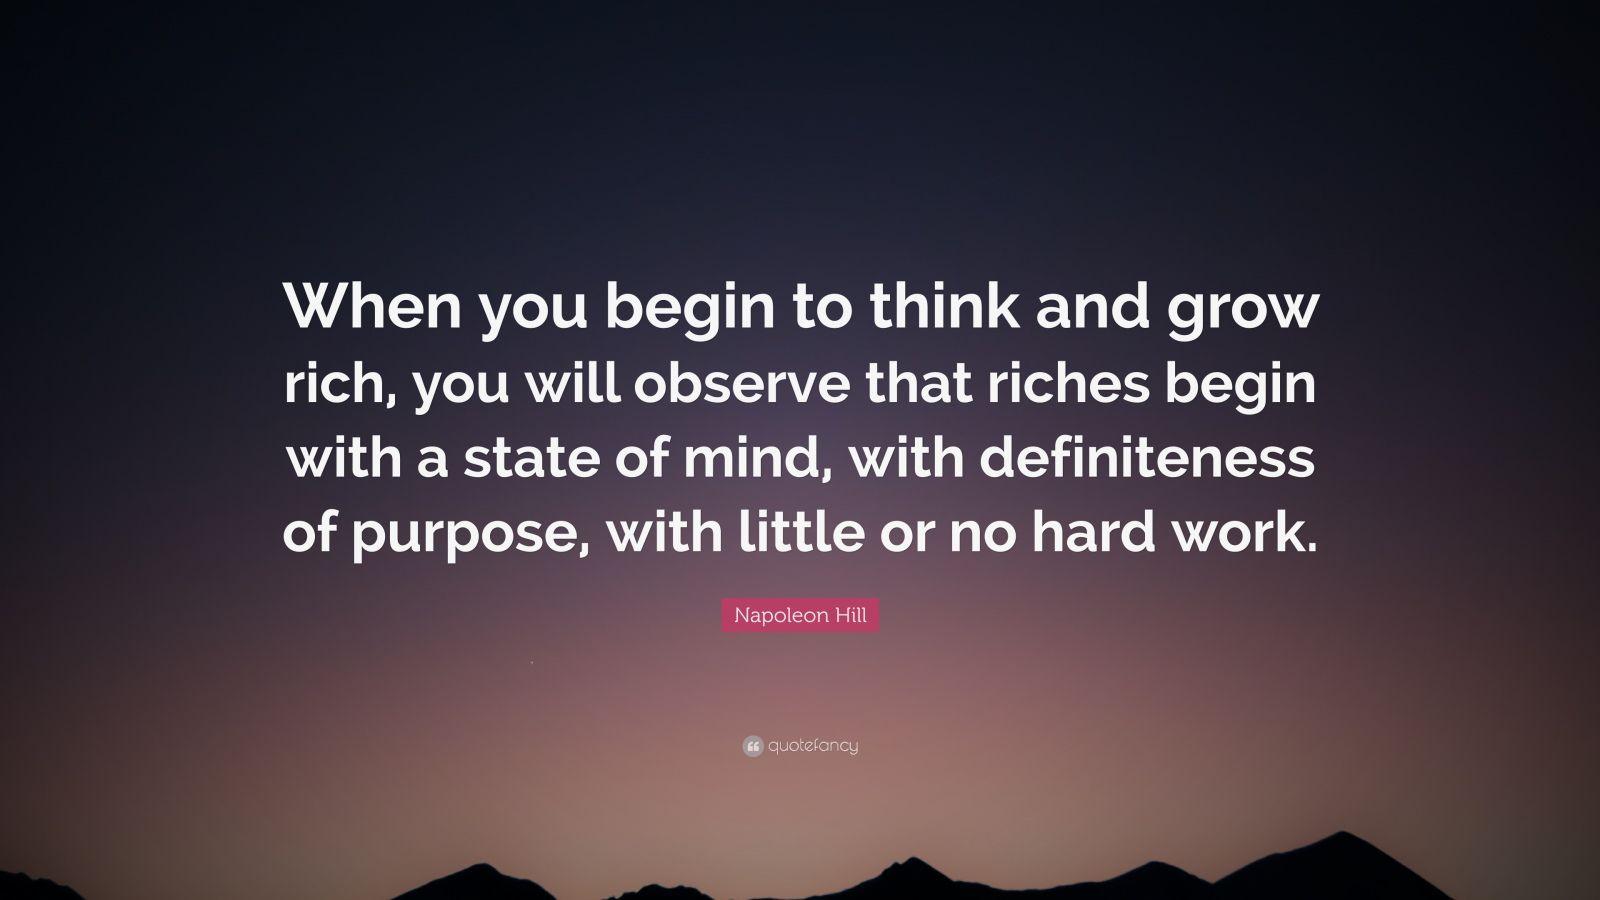 كتاب think and grow rich